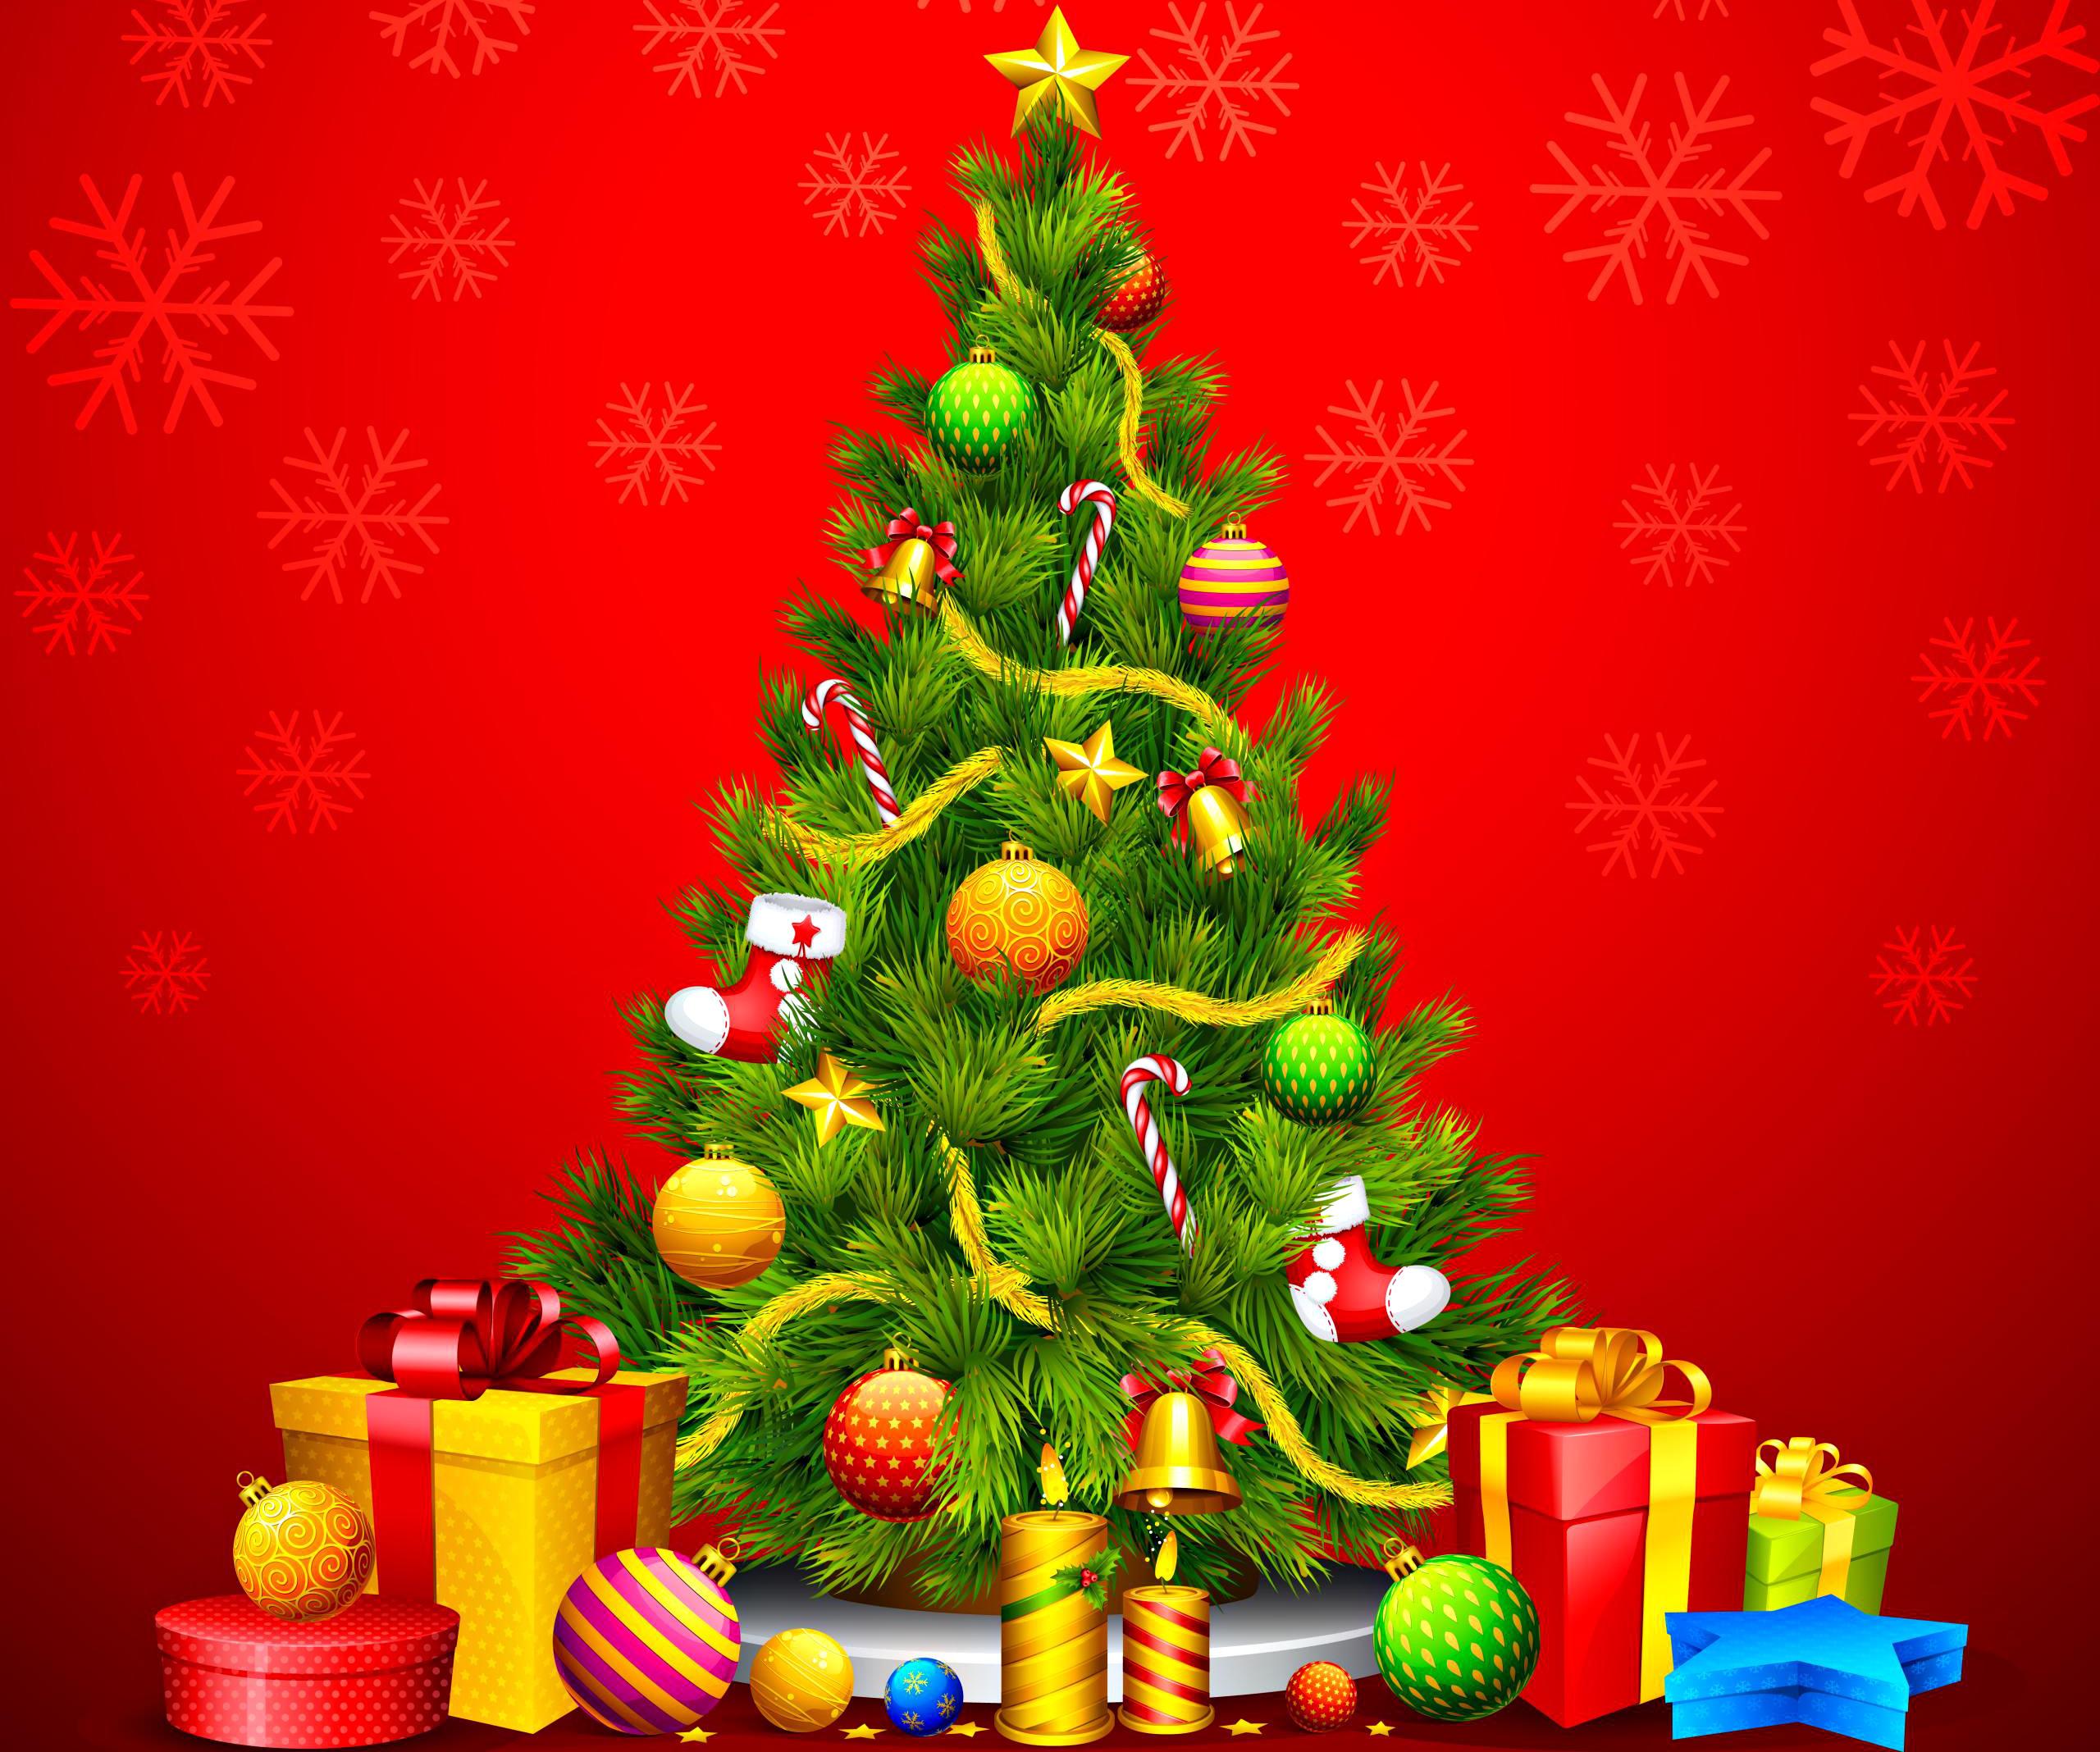 christmas tree animated hd wallpaper new christmas tree and fireplace #9755